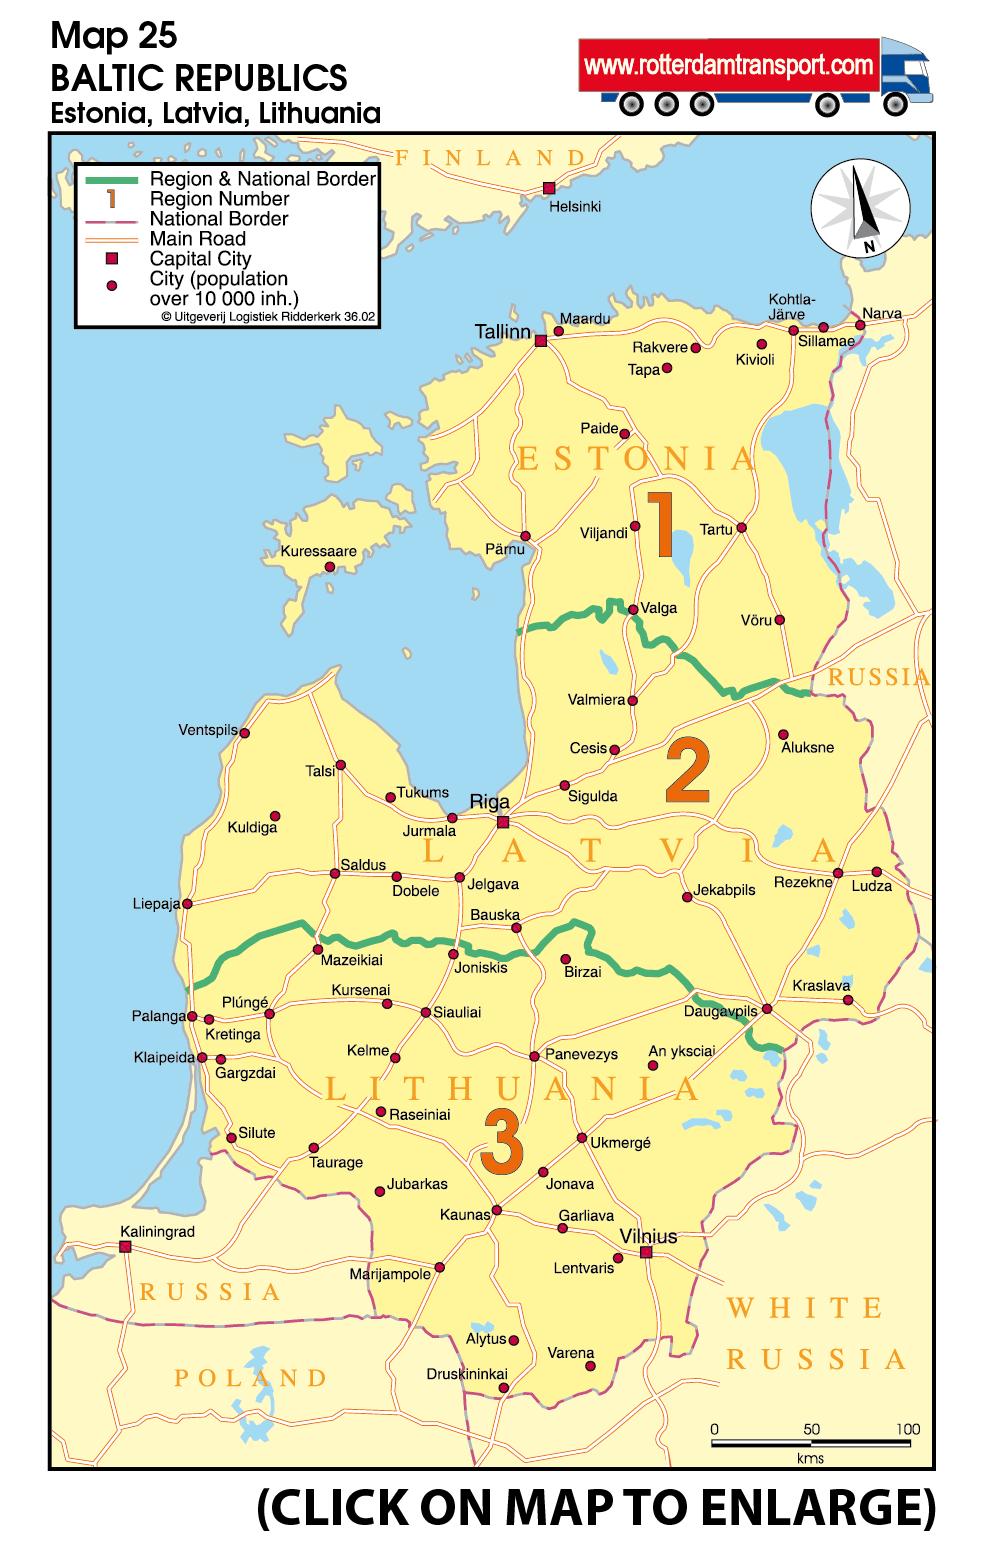 41f6b992cdf www.rotterdamtransport.com - maps groupage by road